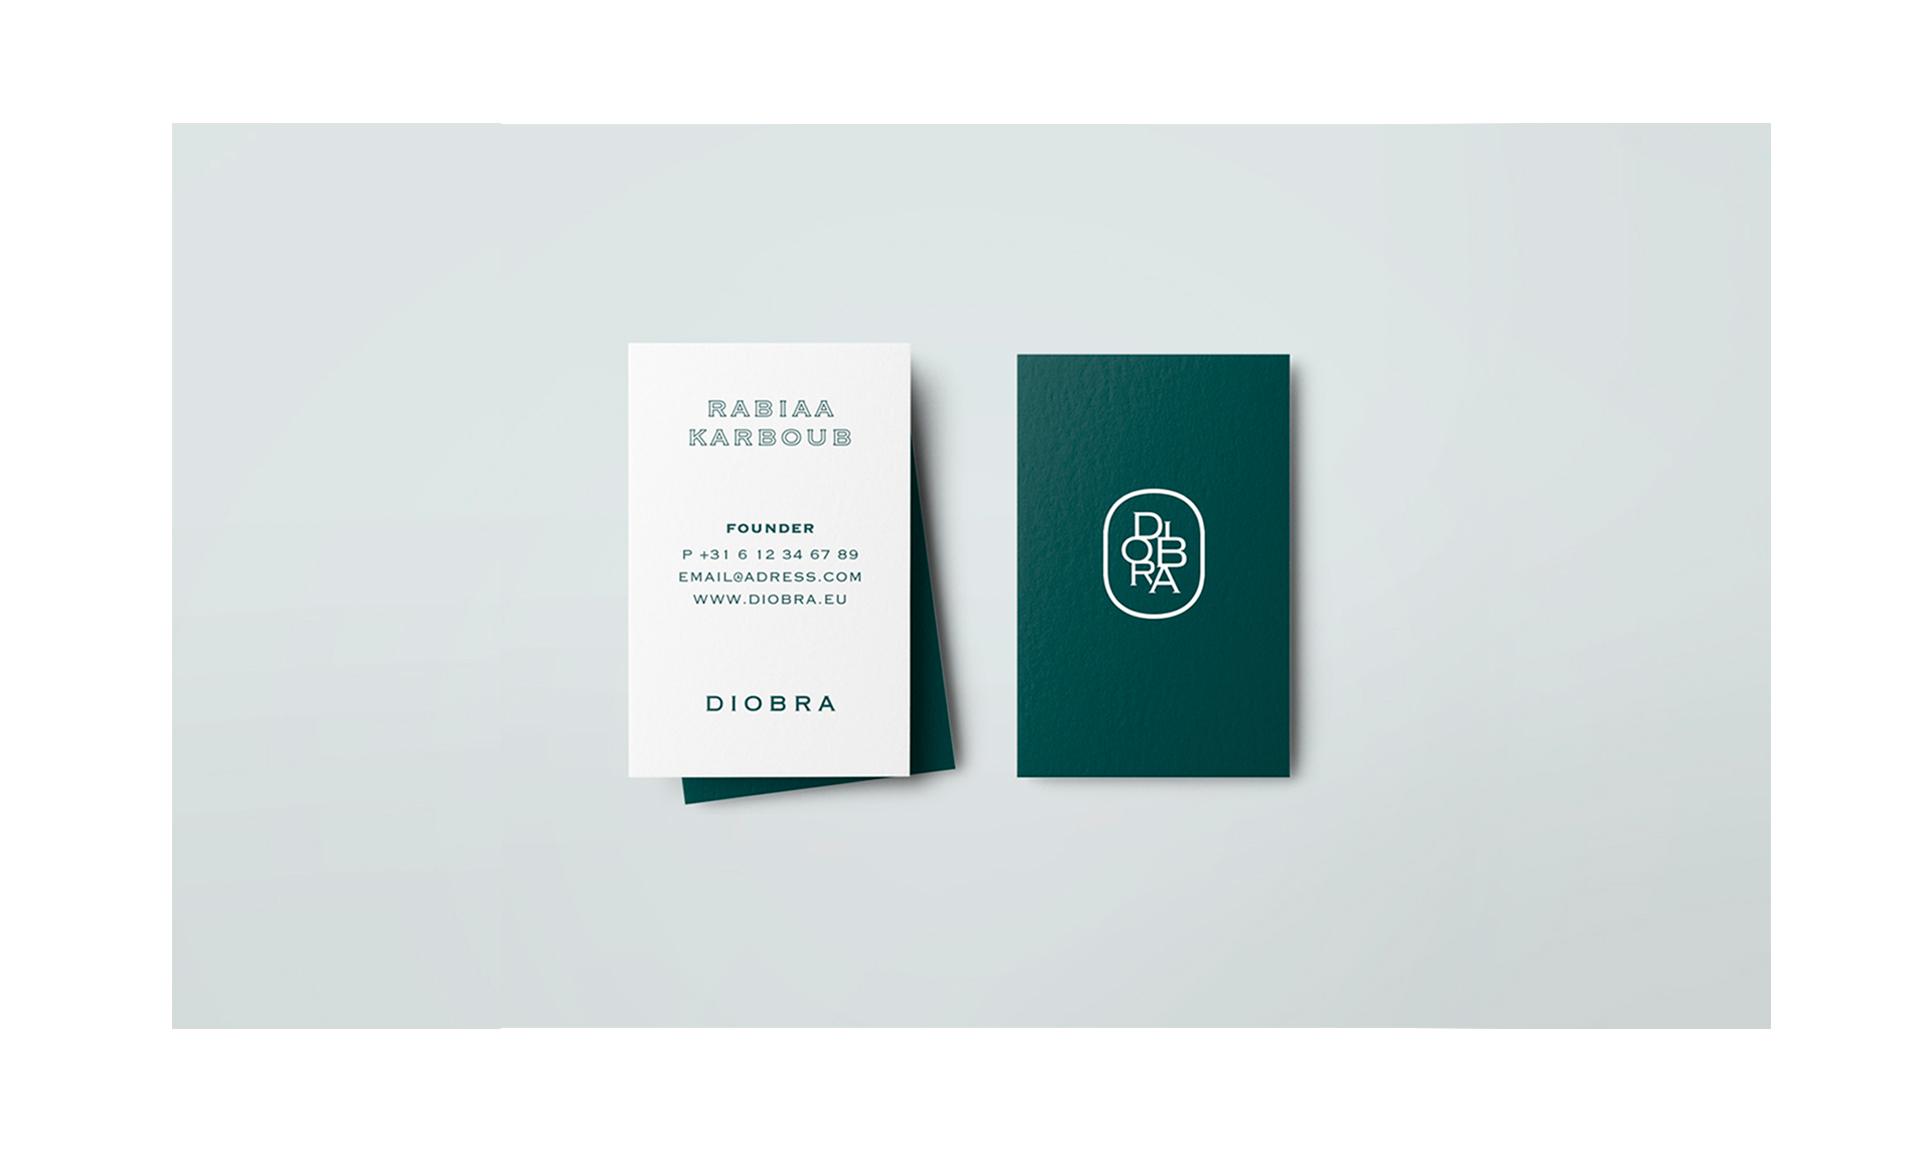 diobra_identity_luxury_businesscard_logo_design_leconcepteur_tamarapruis